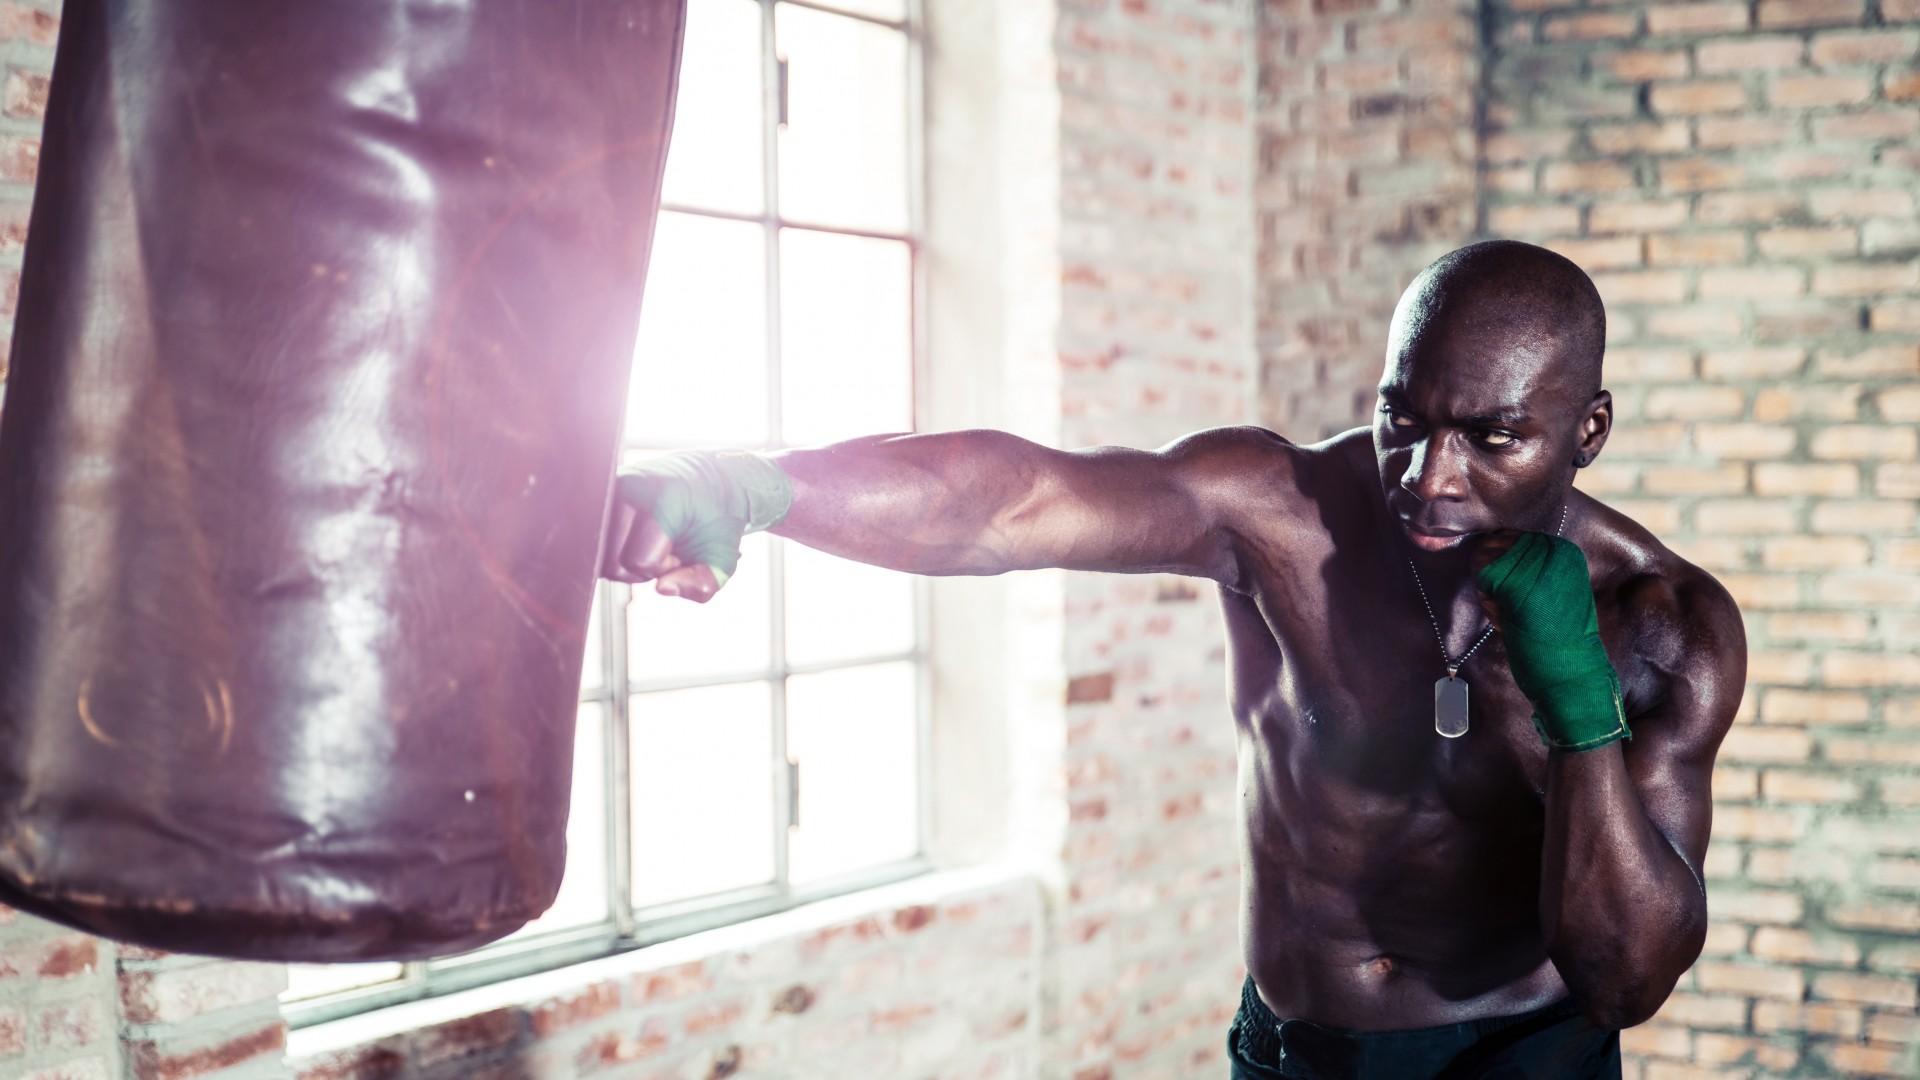 The MMA Clinic